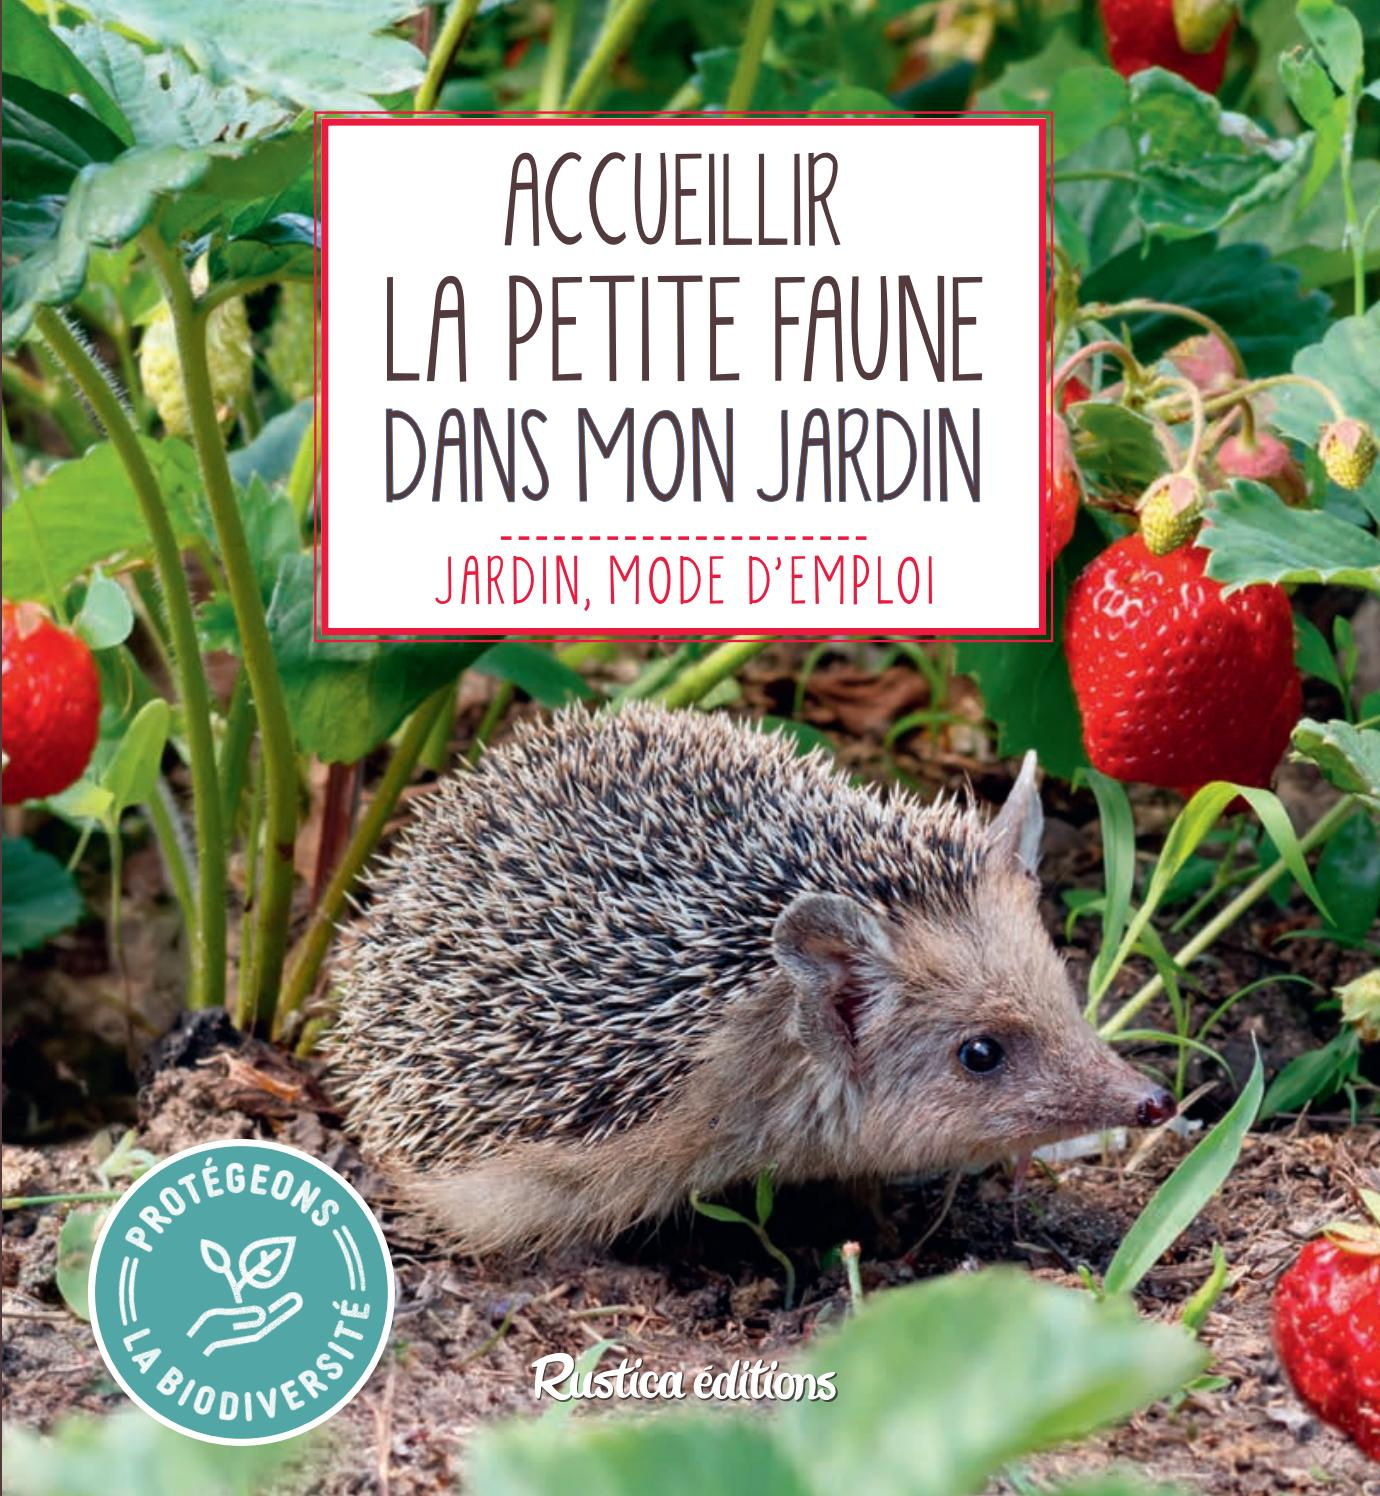 Accueillir La Petite Faune Du Jardin By Fleurus Editions - Issuu serapportantà Nourriture Hérisson Jardin